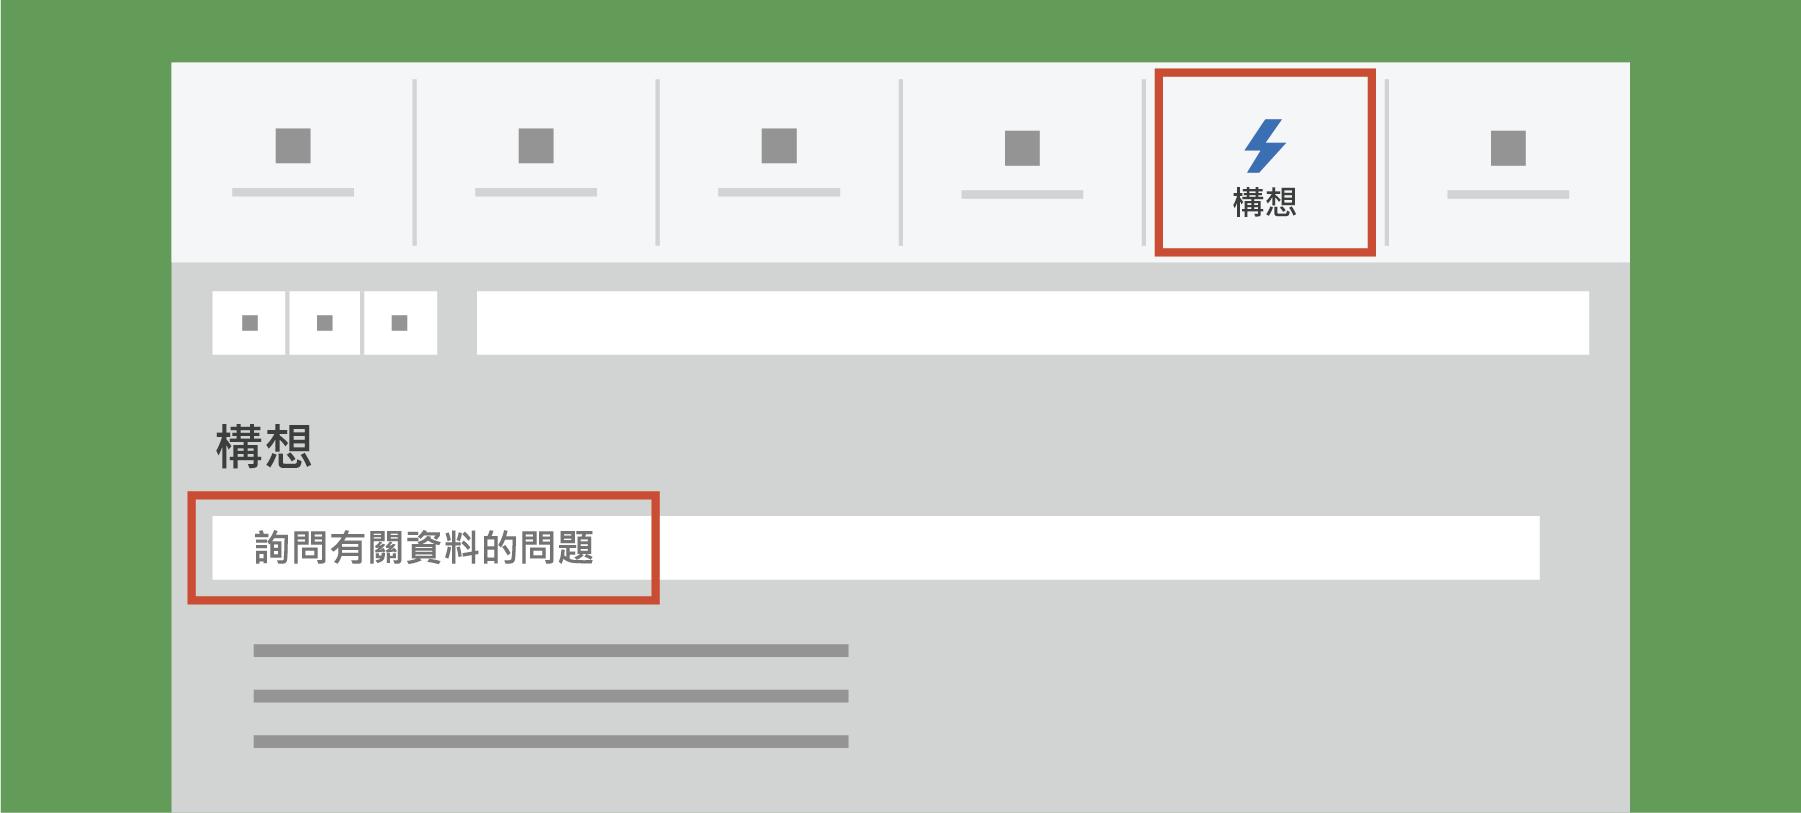 在 Excel 顯示 [構想]